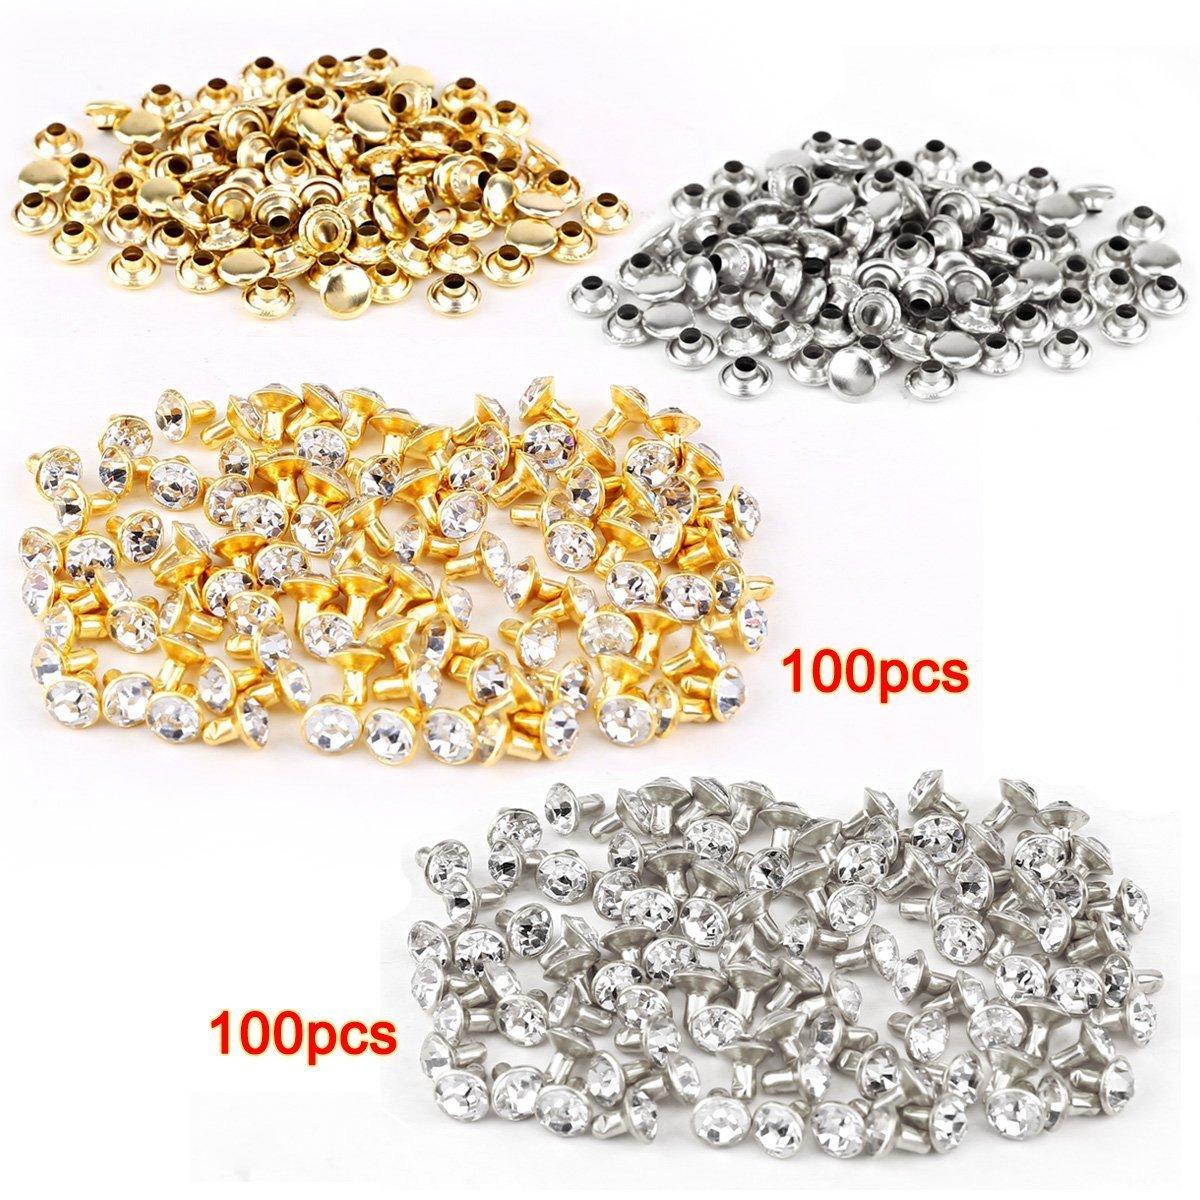 Rivet-SODIAL(R) 100pcs silver + 100 pcs golden Rivet with rhinestone diamond 7mm AEQW-WER-AW124583